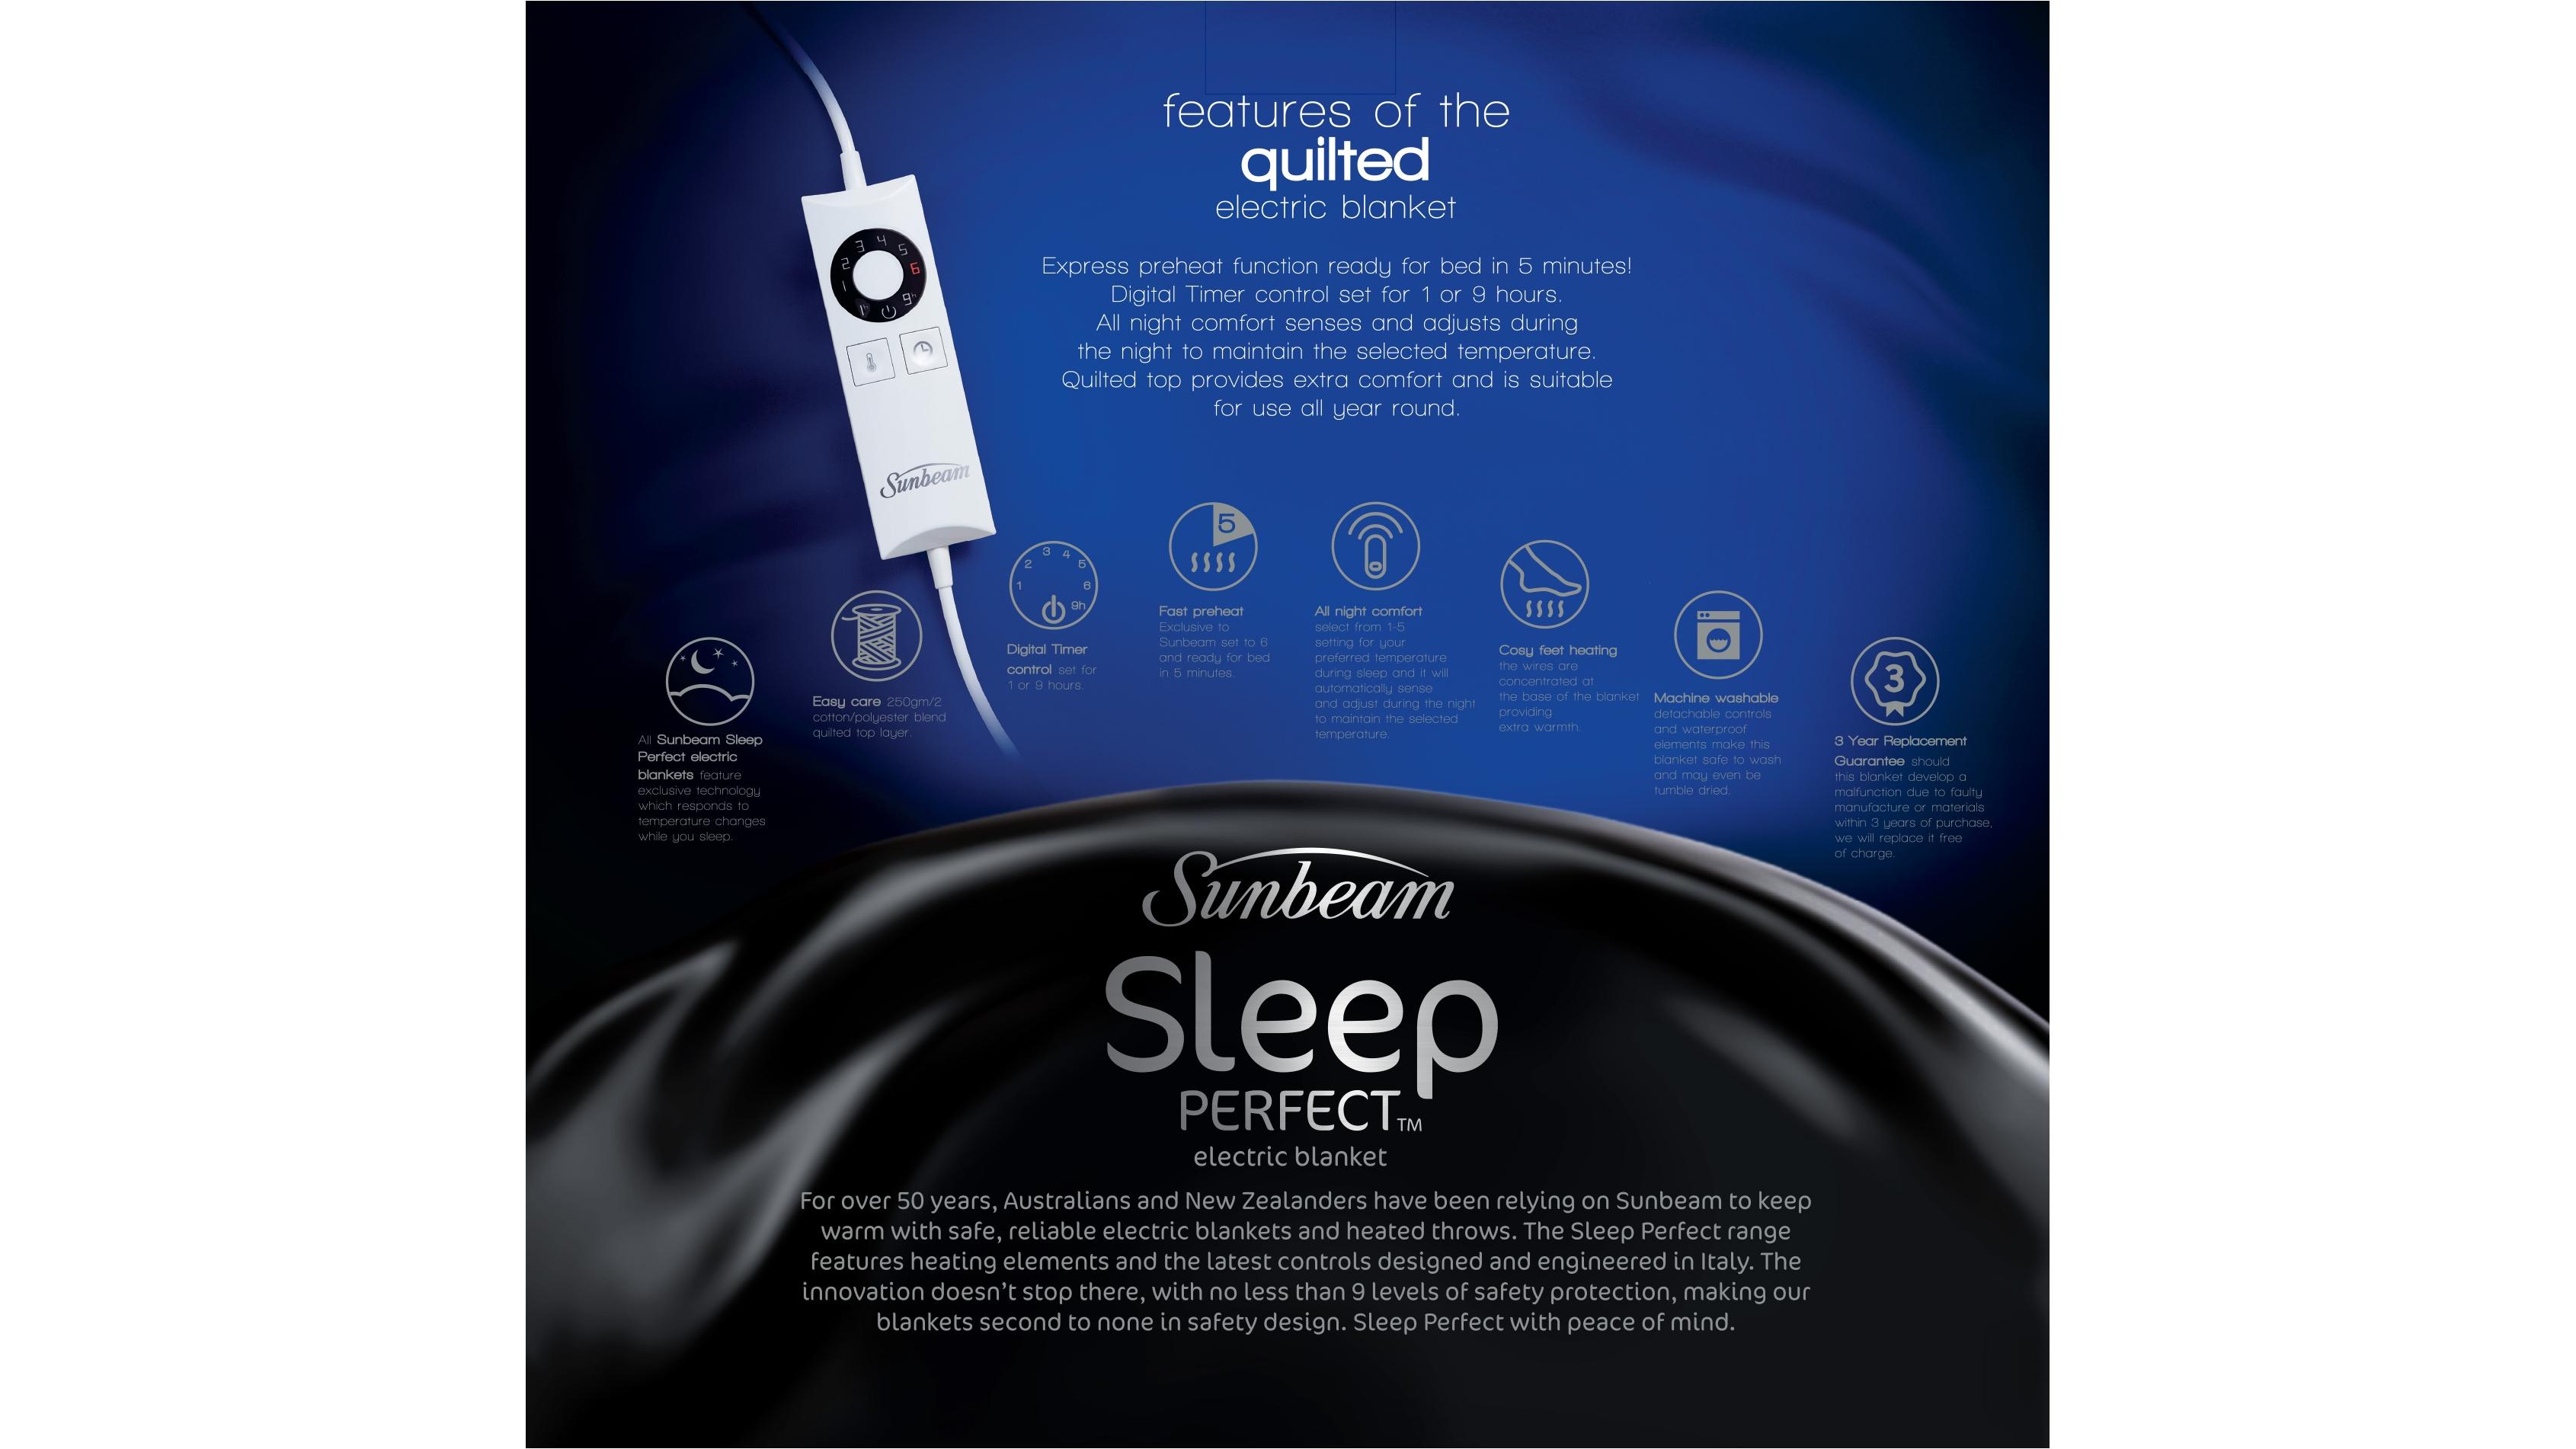 907ead1514 Buy Sunbeam Sleep Perfect Quilted Electric Blanket - Queen Bed ...